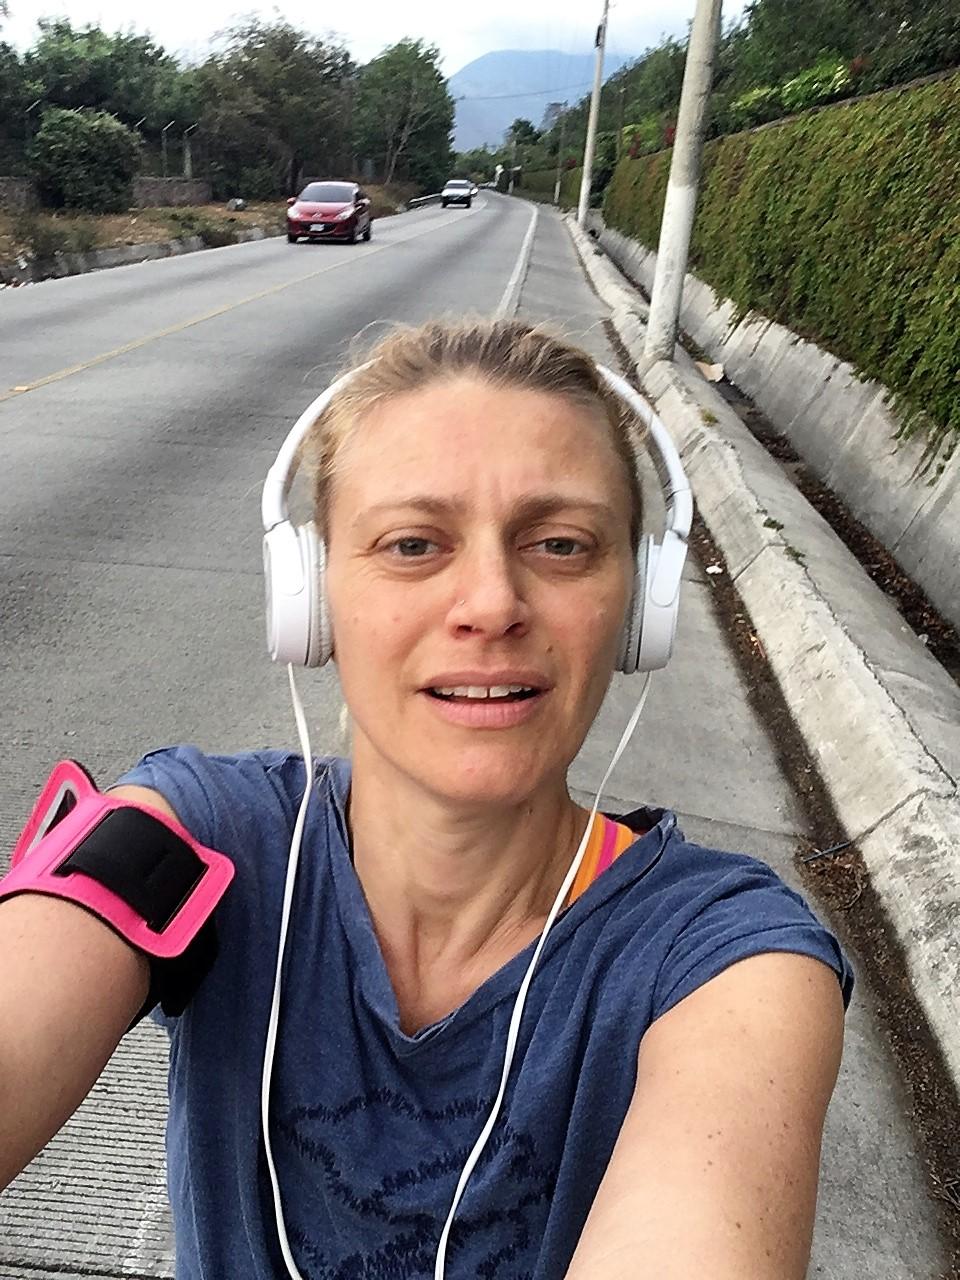 Training For a Marathon - risks